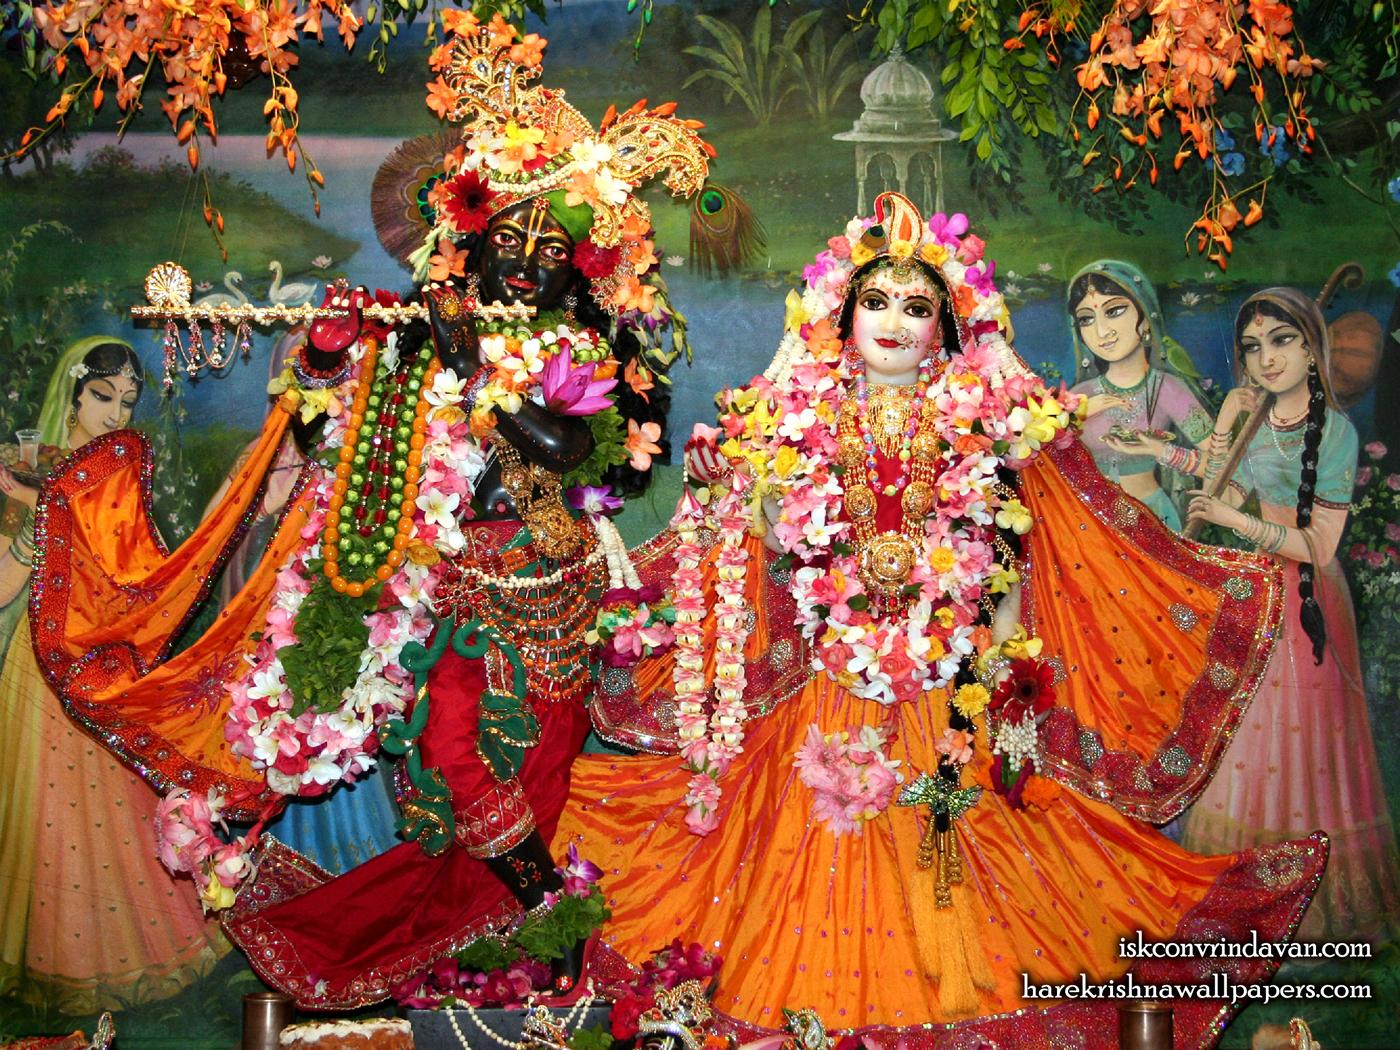 Sri Sri Radha Shyamsundar Wallpaper (017) Size 1400x1050 Download